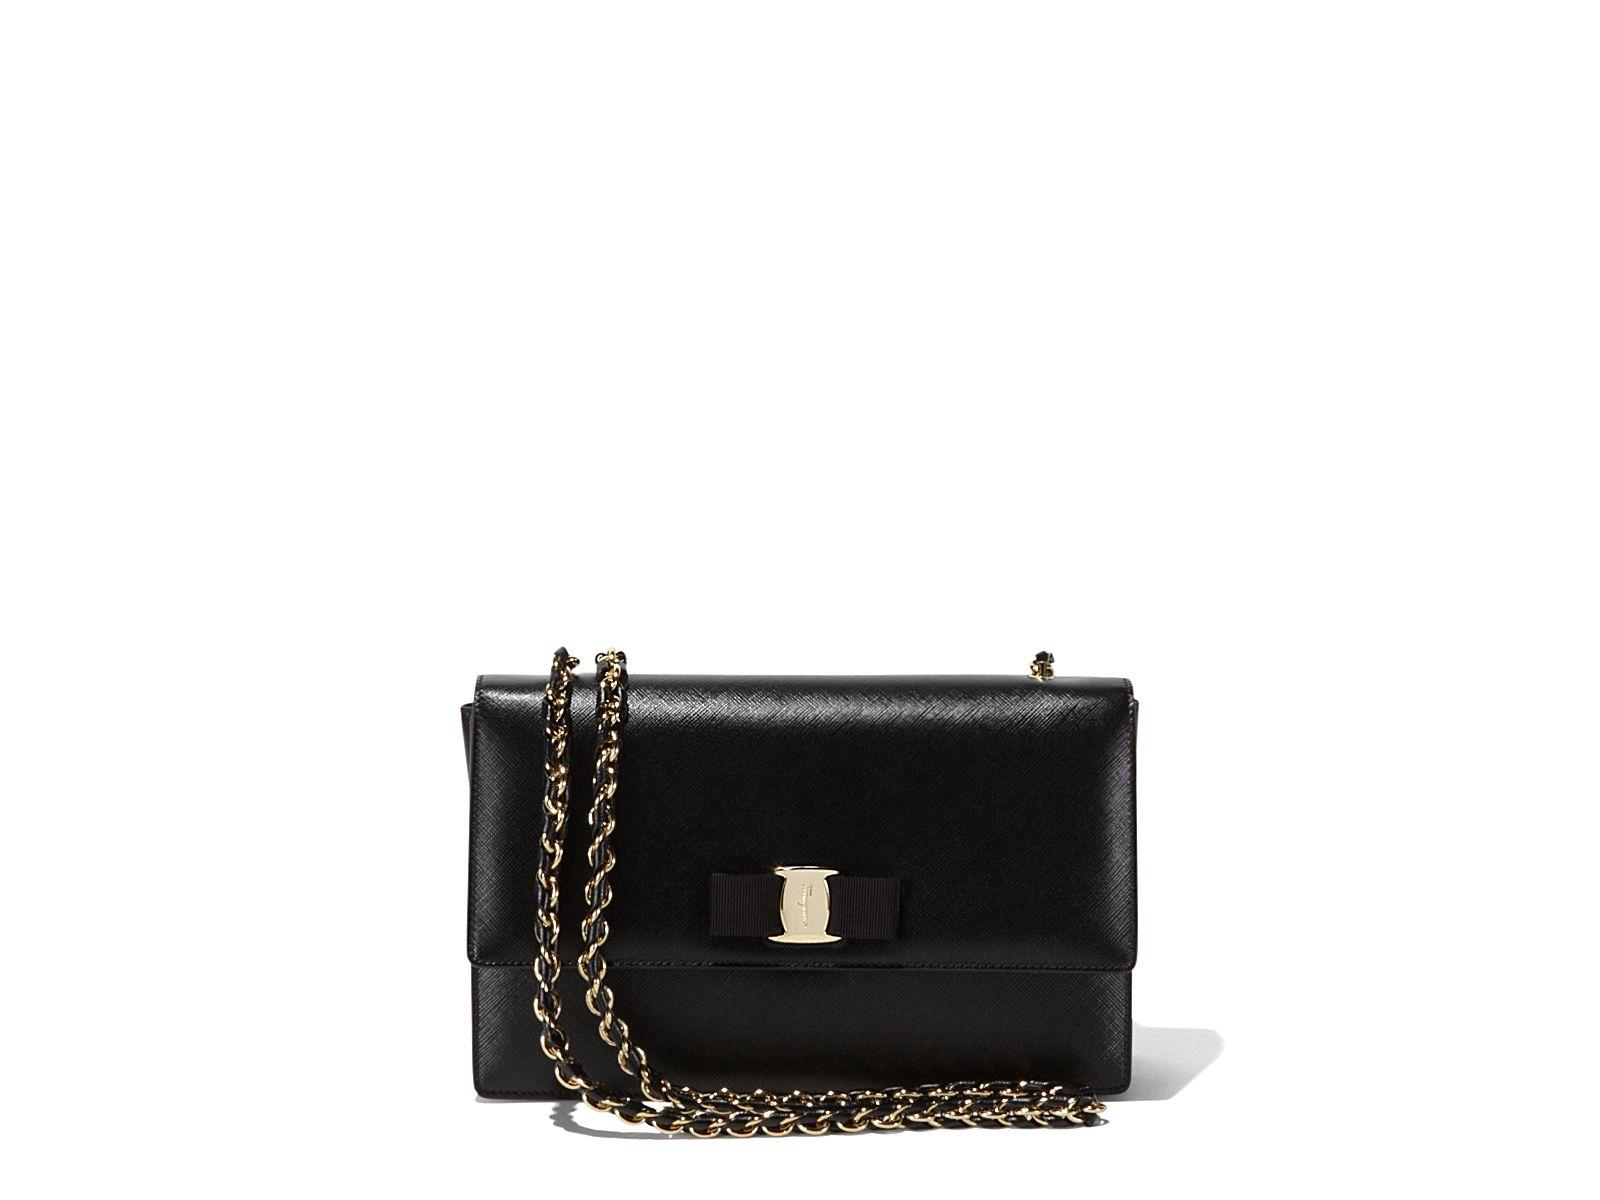 851f019054 Medium Vara Flap Bag - Handbags - Women - Salvatore Ferragamo ...